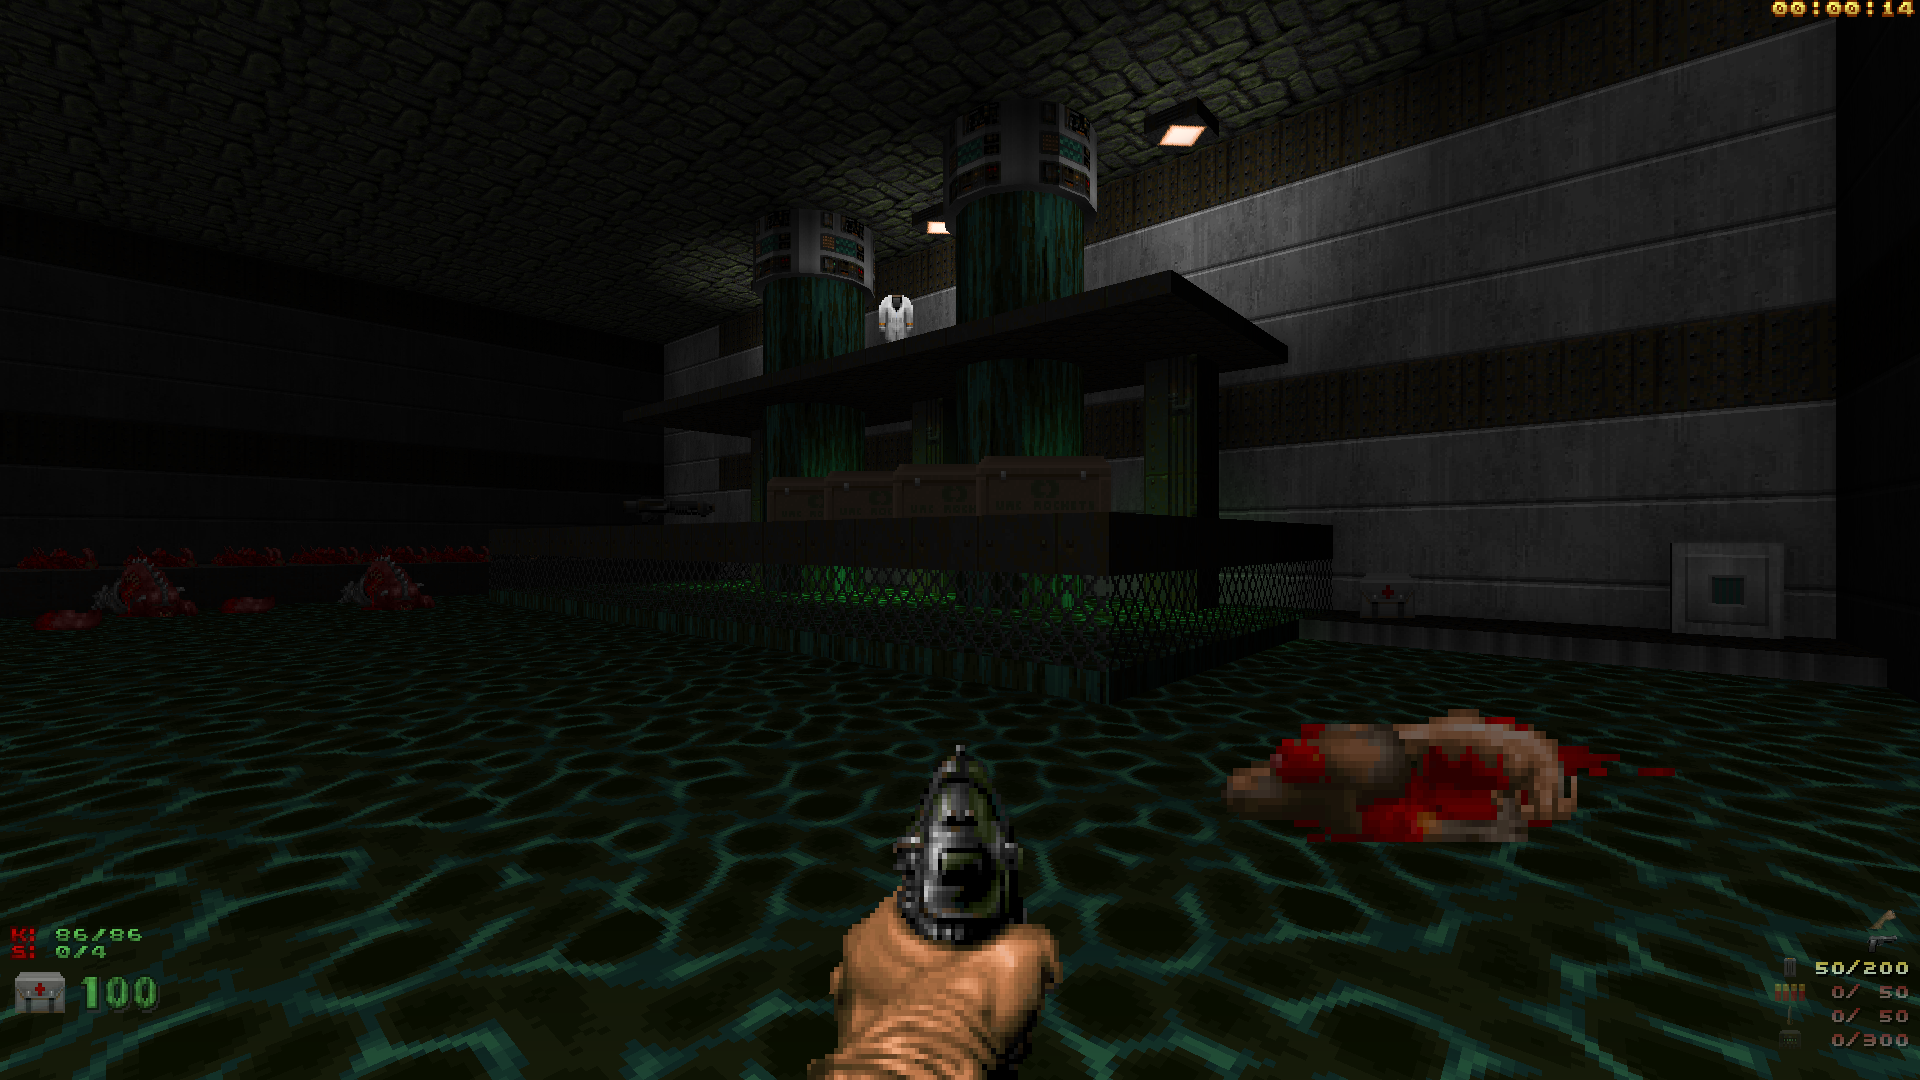 Screenshot_Doom_20210322_090509.png.99850fa1f2ac8bbf8d76cdf64e3320dc.png